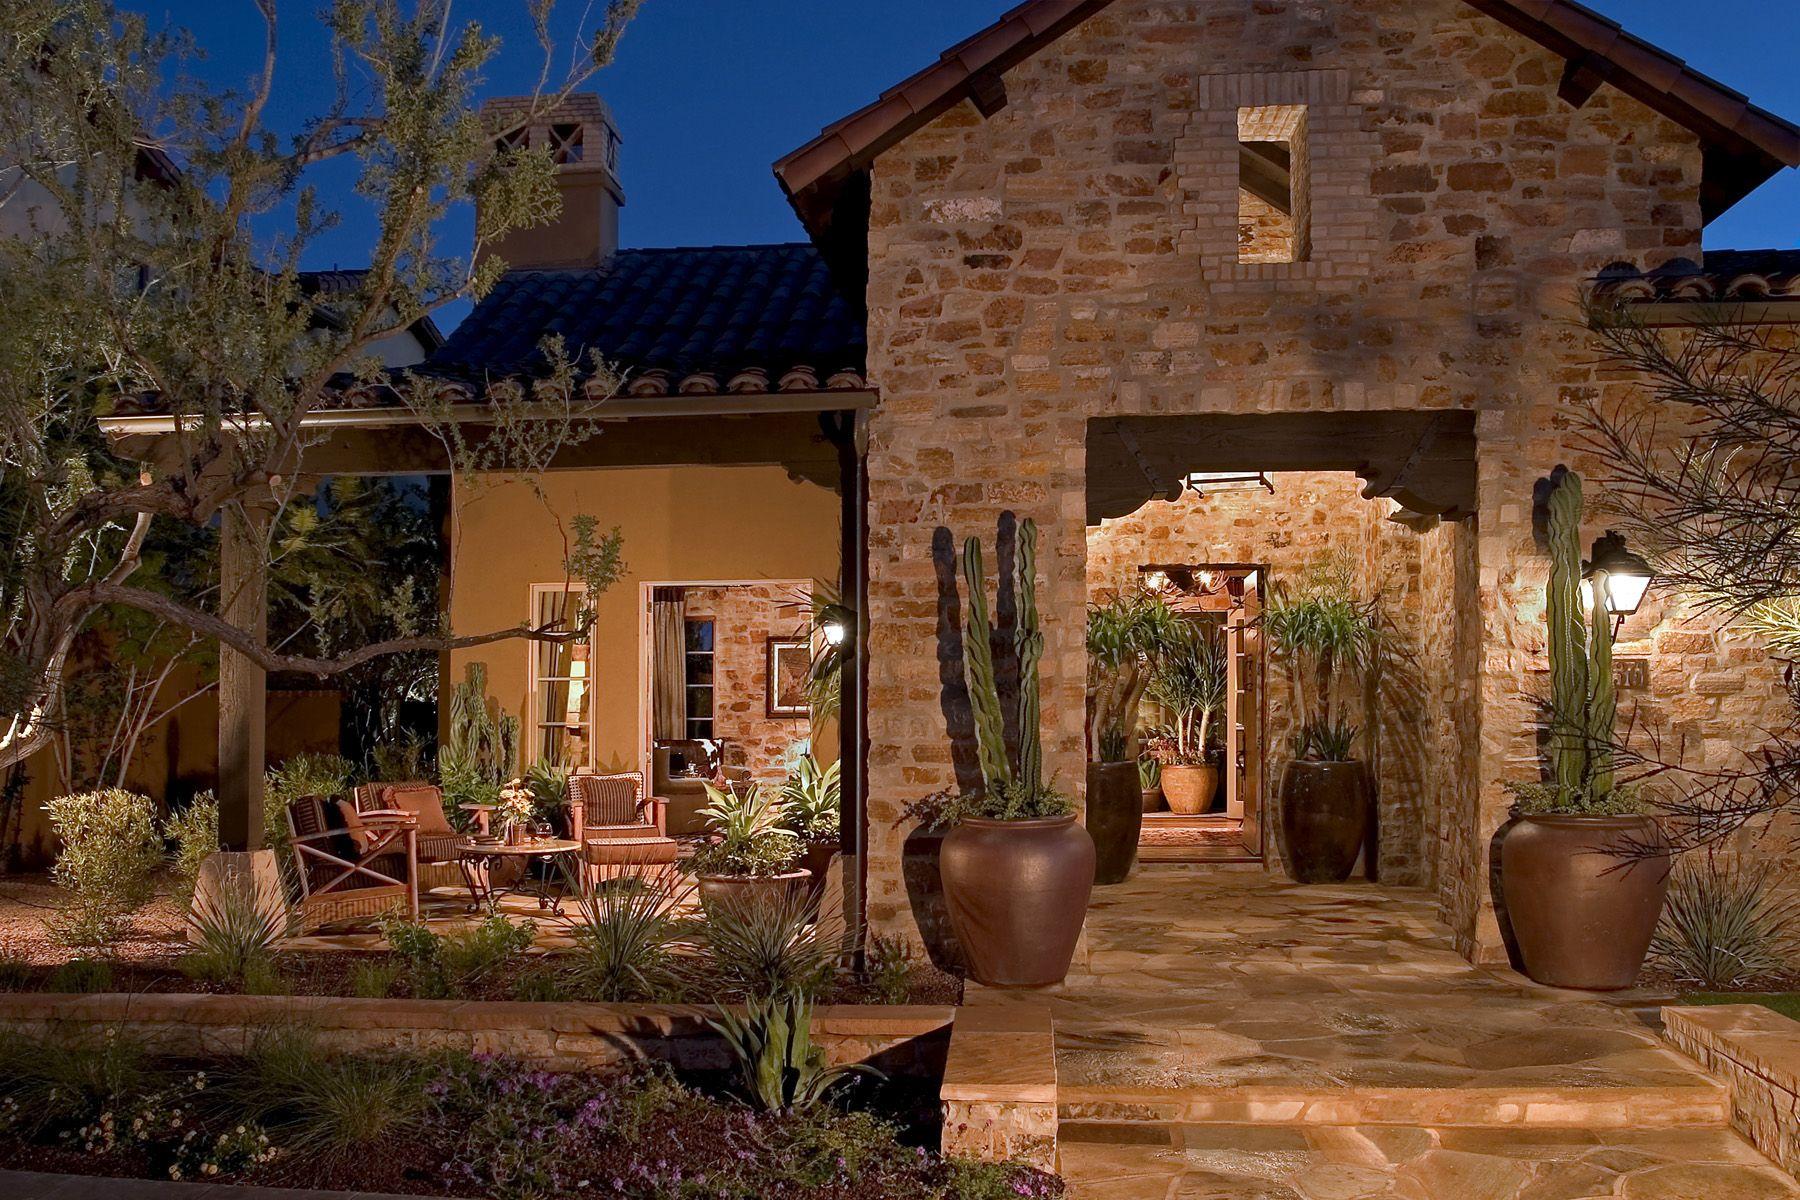 Best Kitchen Gallery: Plan 5 At Verandahs At Silverleaf In Scottsdale Az Outdoor Living of Scottsdale Arizona Home Builder on rachelxblog.com